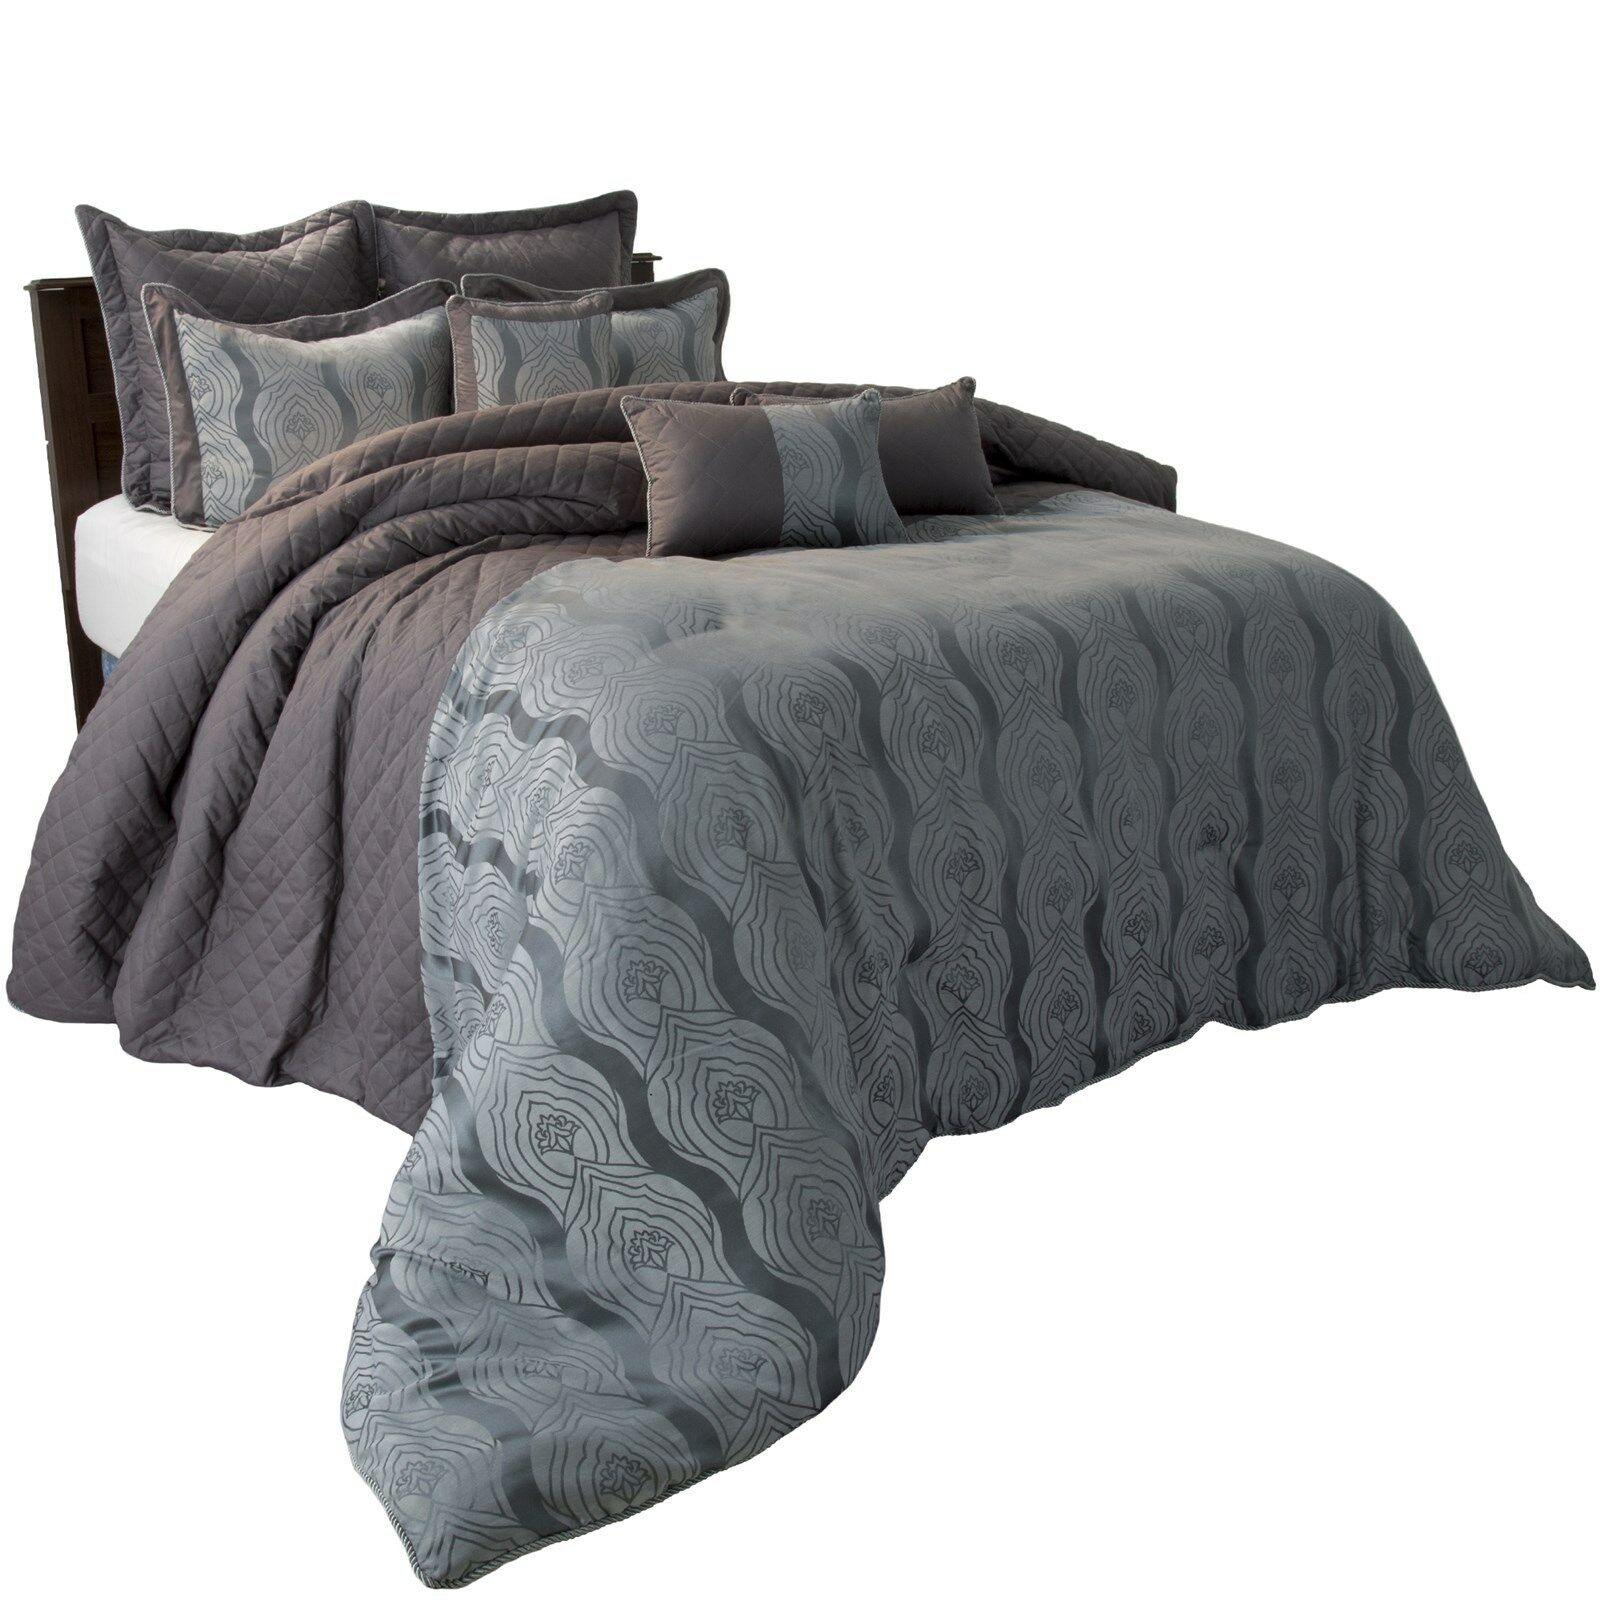 Lavish Home 9 PC High Quality 100 Cotton Jolene forter Set King